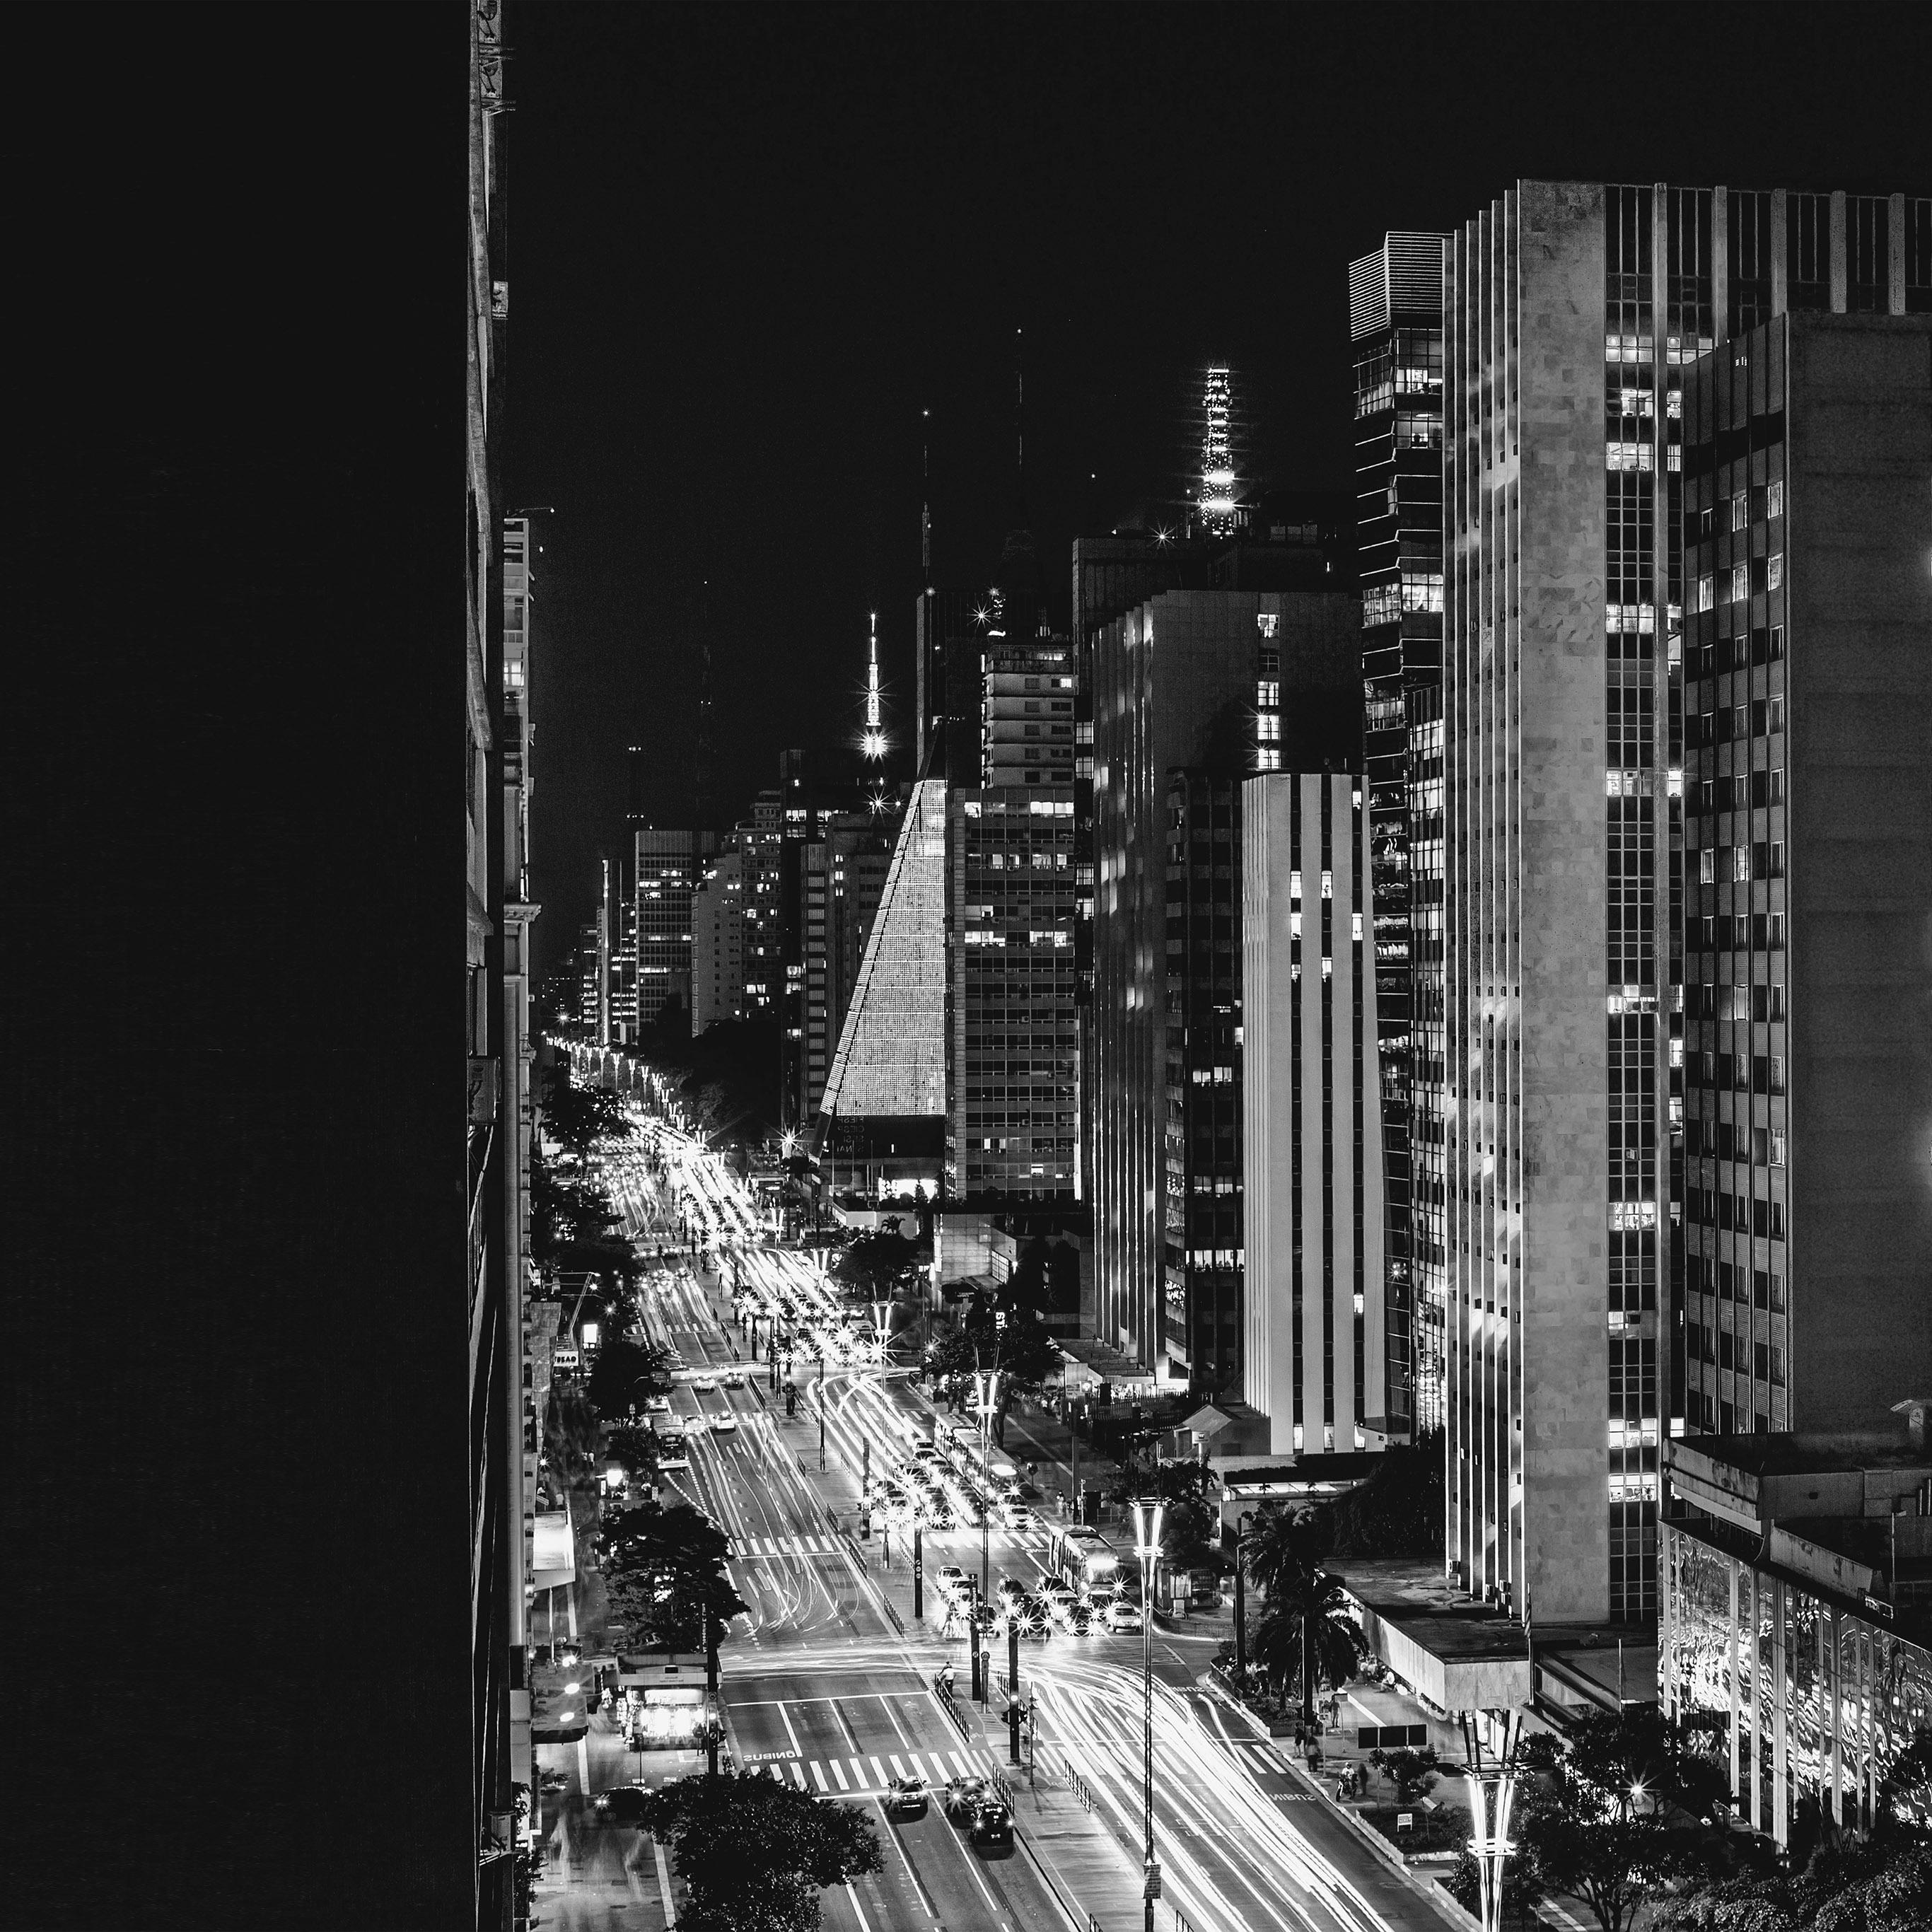 Urban View: Nf07-city-night-view-urban-street-bw-dark-wallpaper